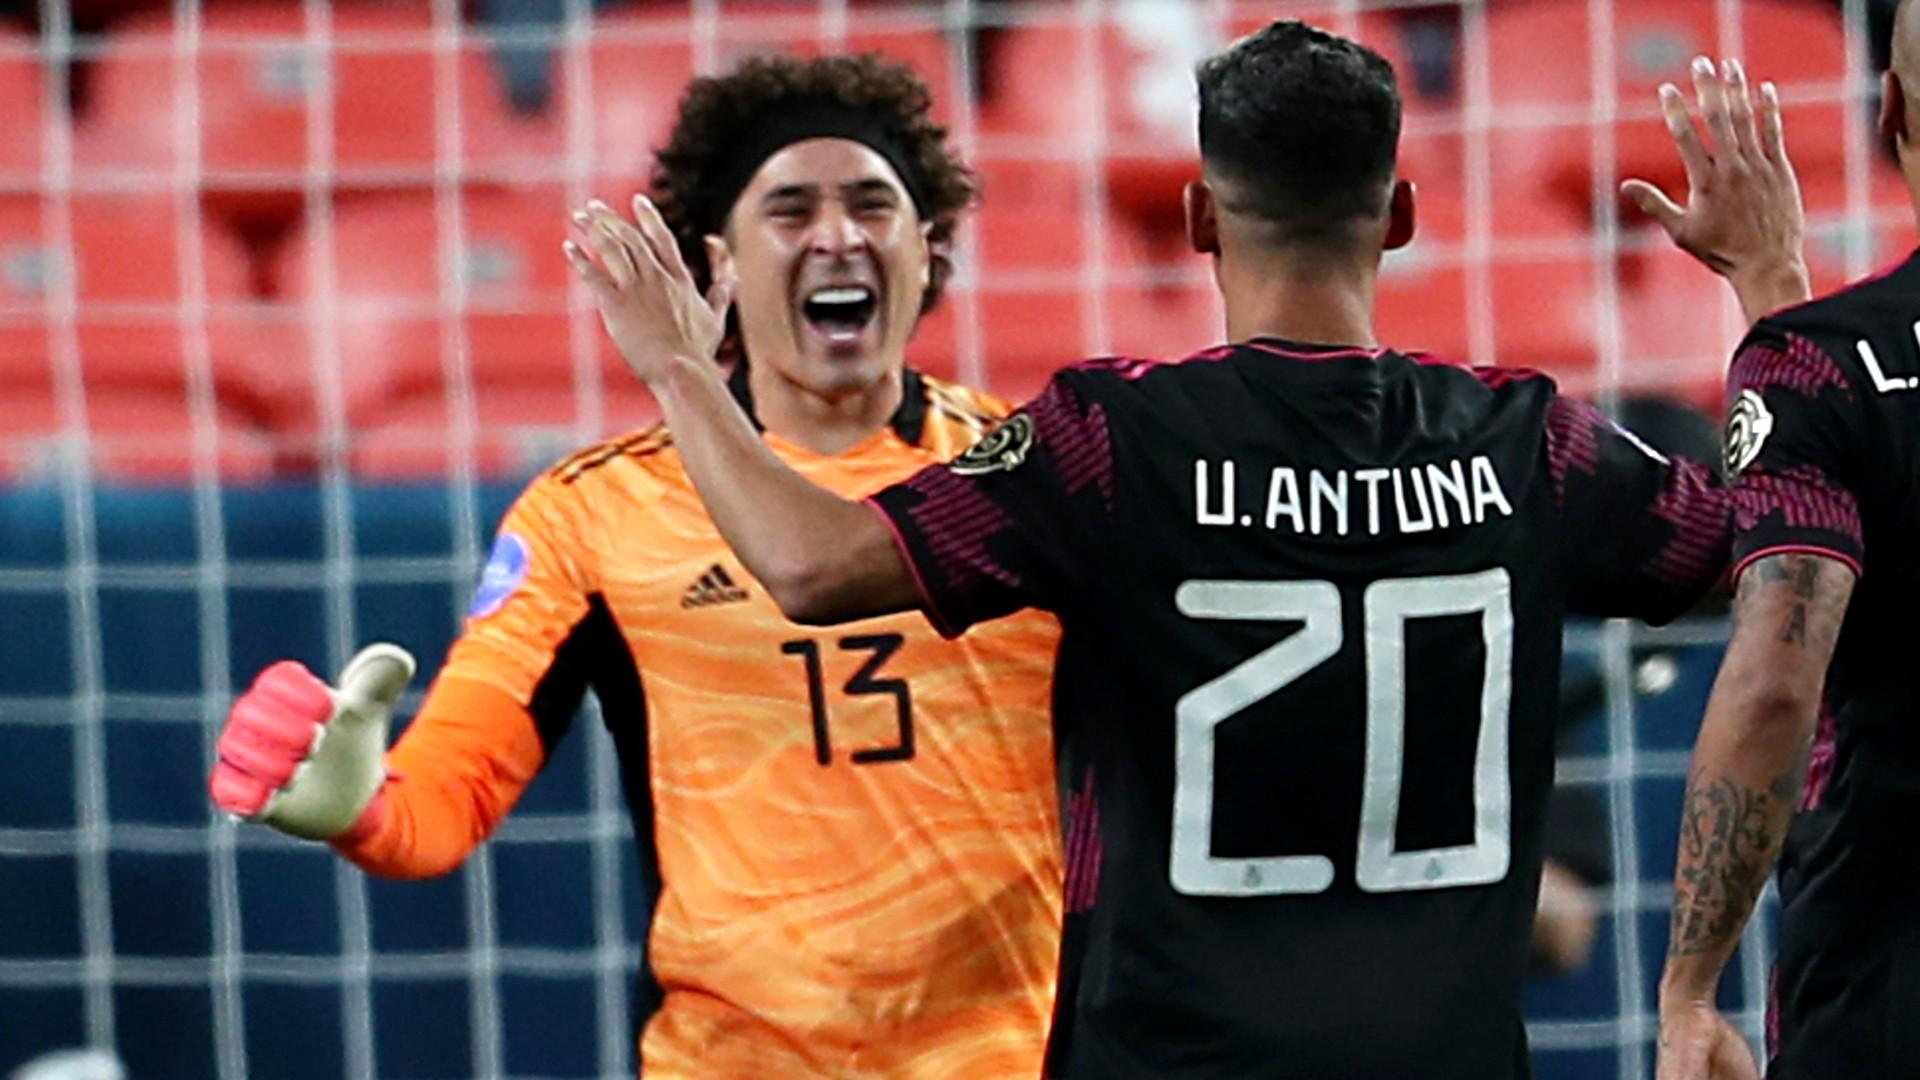 Mexico vs. Costa Rica score, result, highlights: El Tri need PKs to make Nations League final